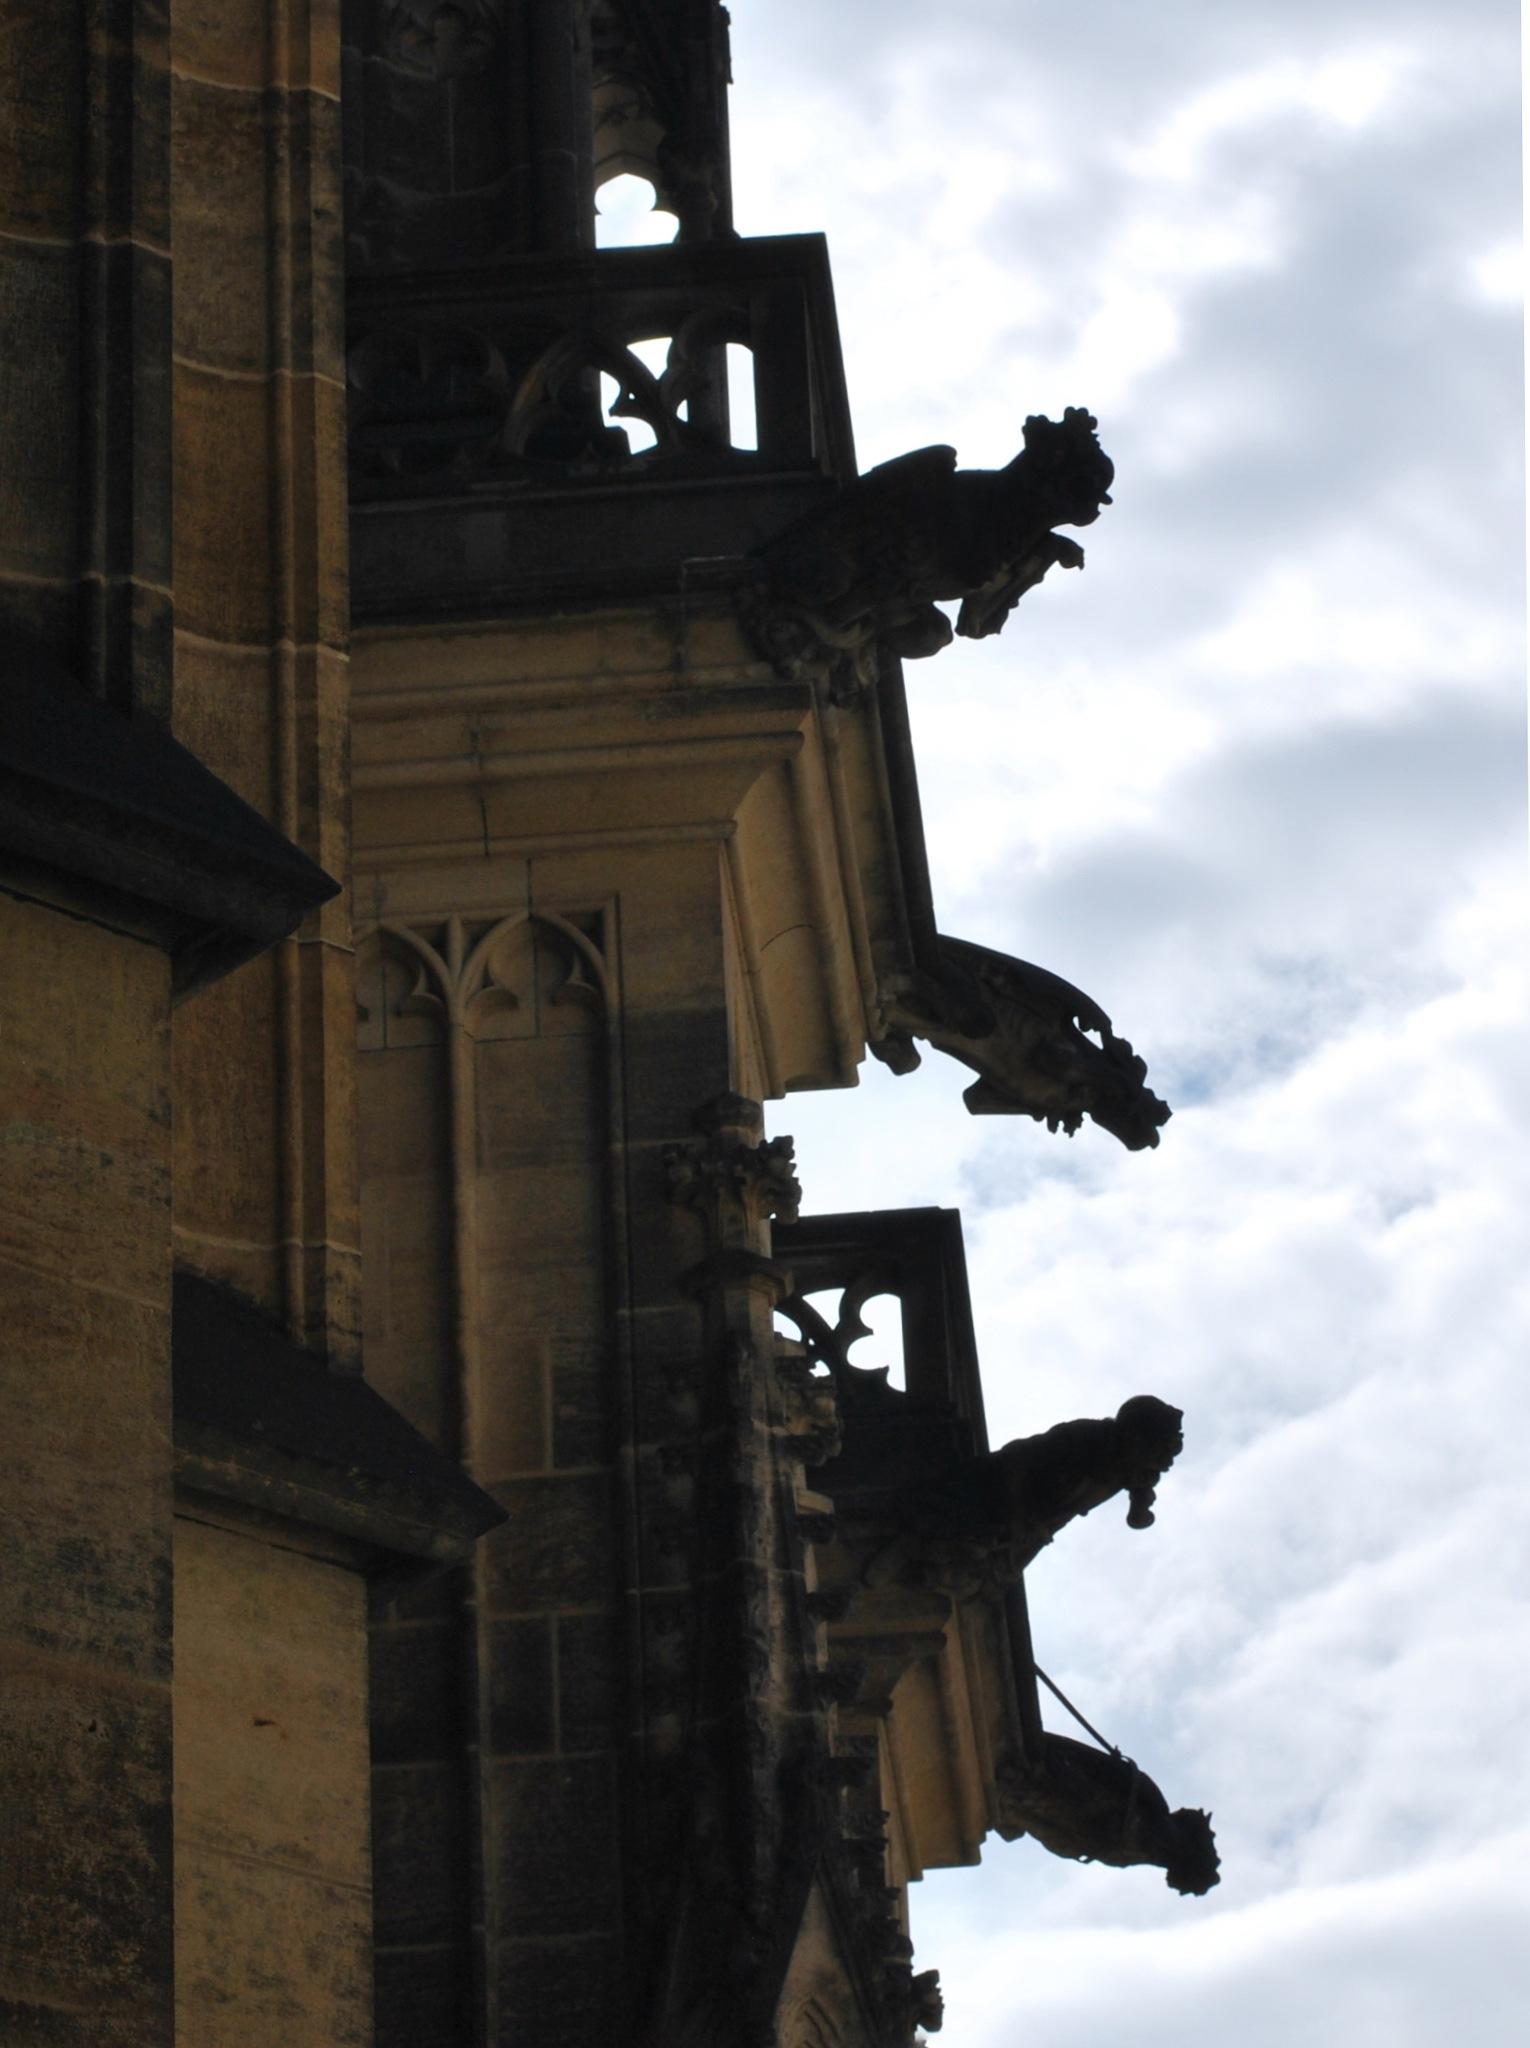 //Gargoyles in Prague// by Anda Cadariu